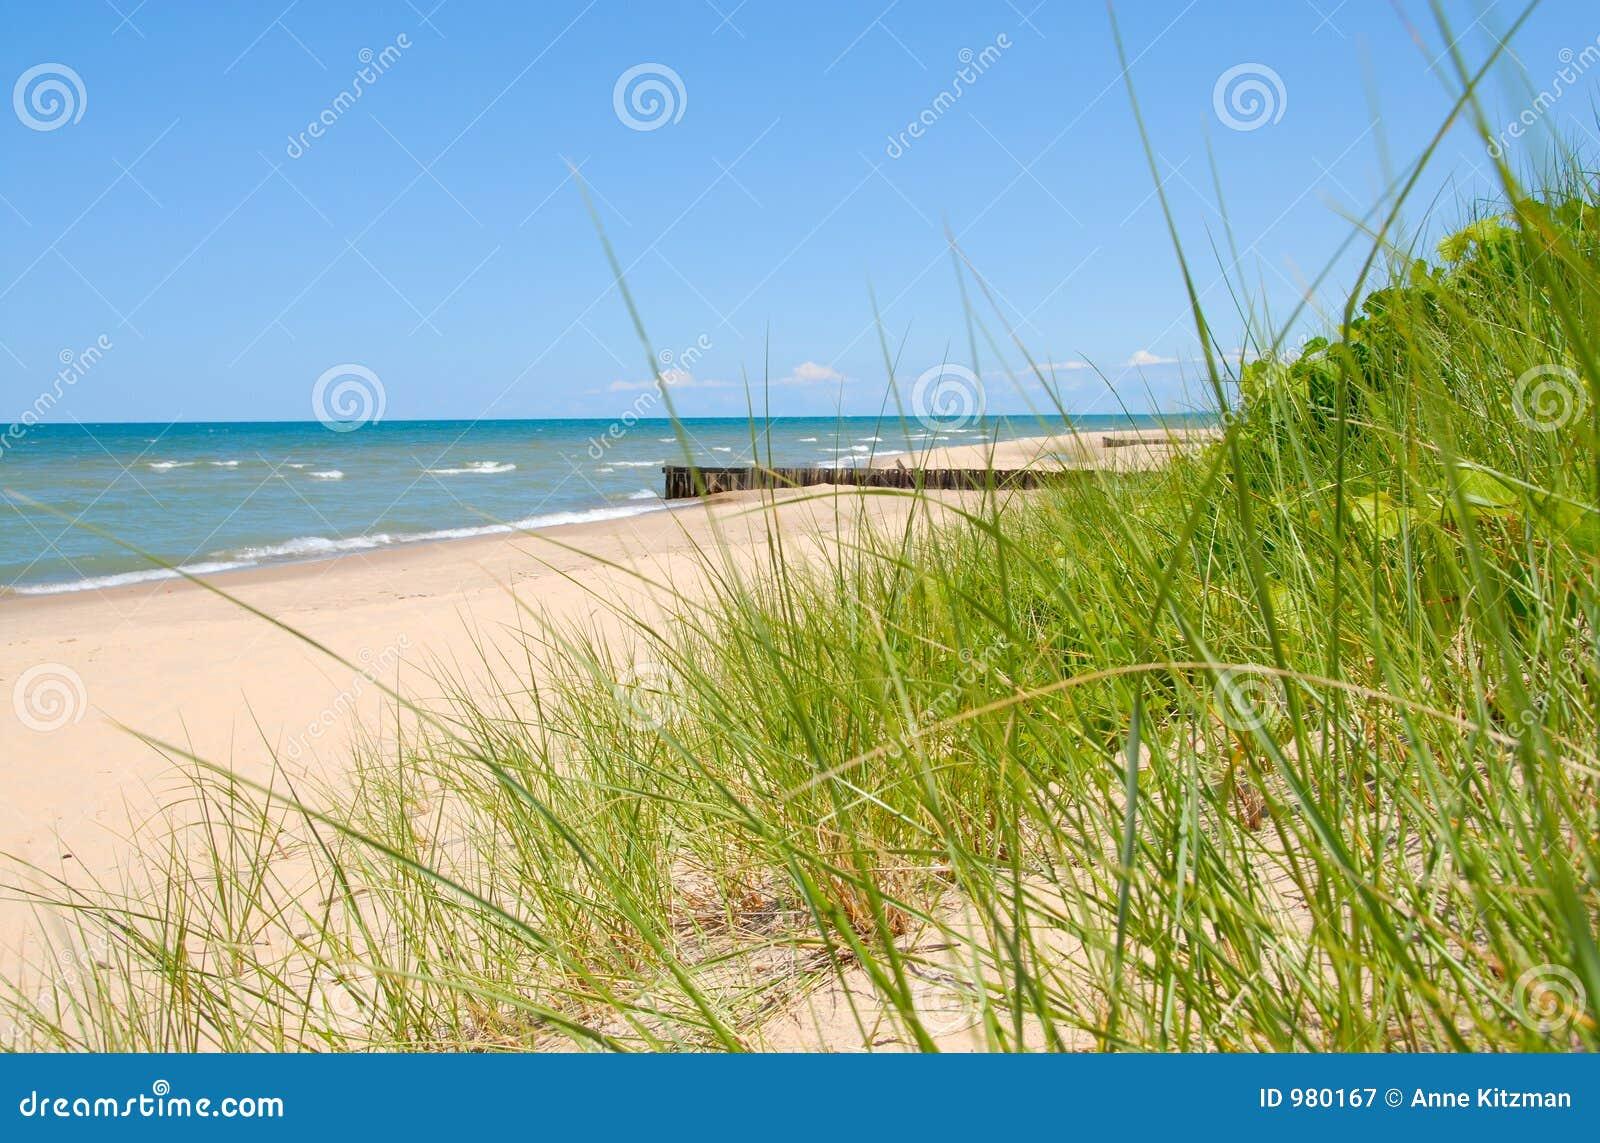 Lakemichigan shoreline